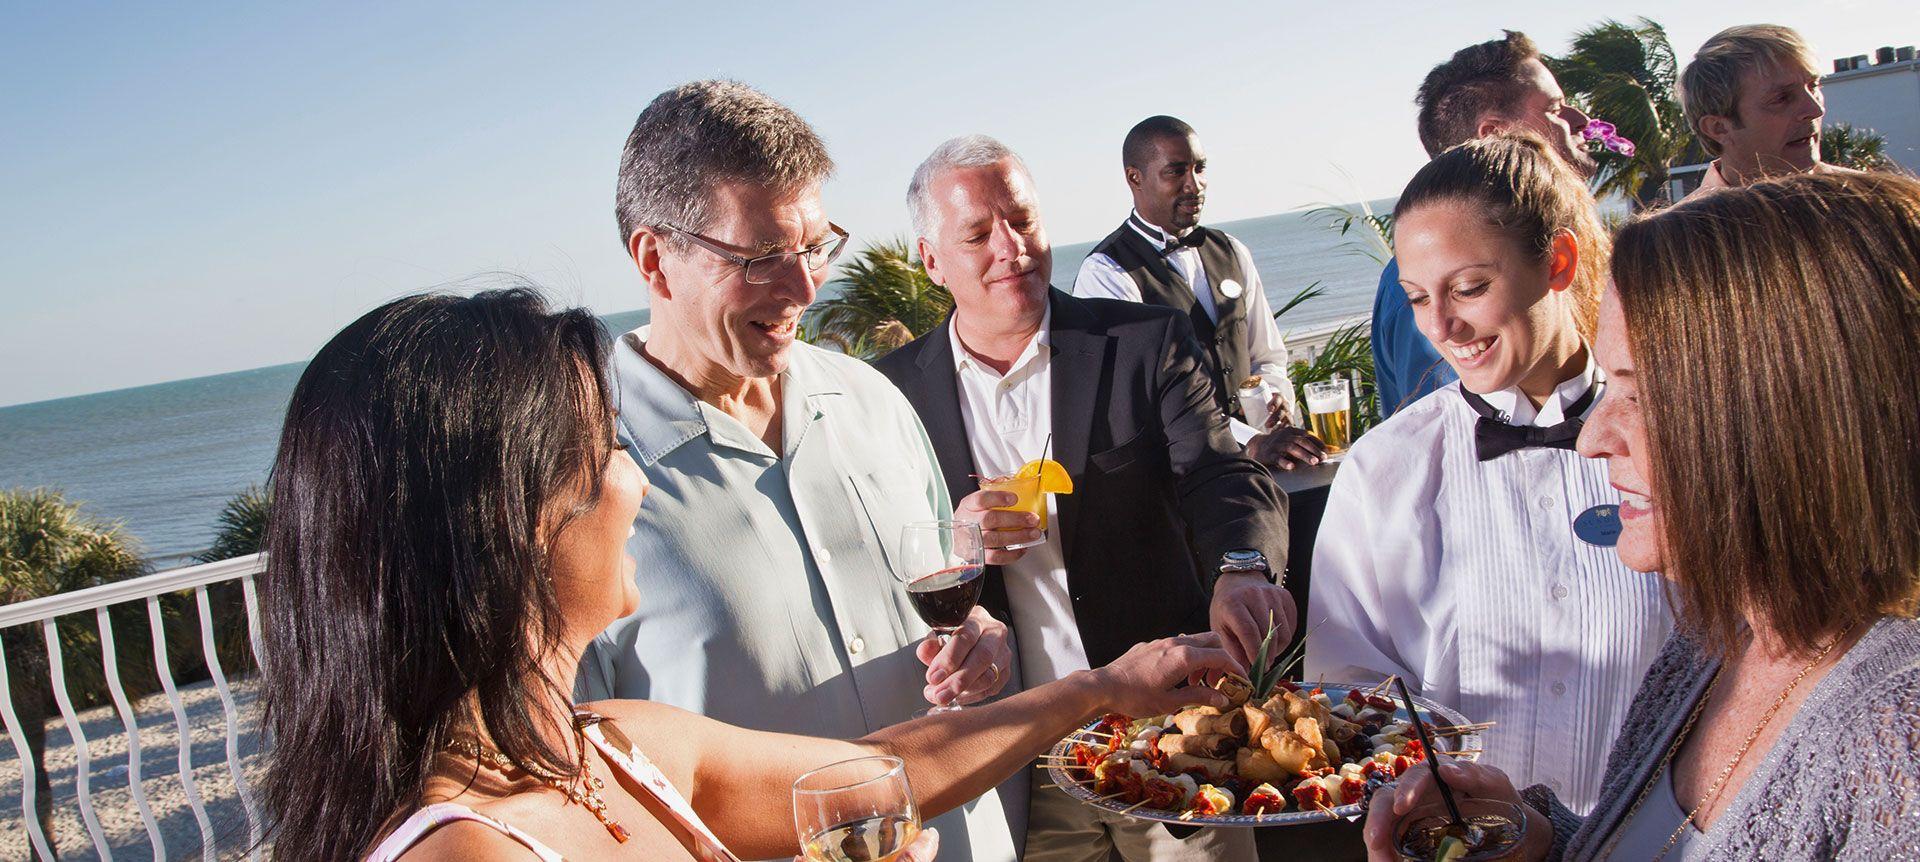 Sundial Beach Resort & Spa - Corporate Events